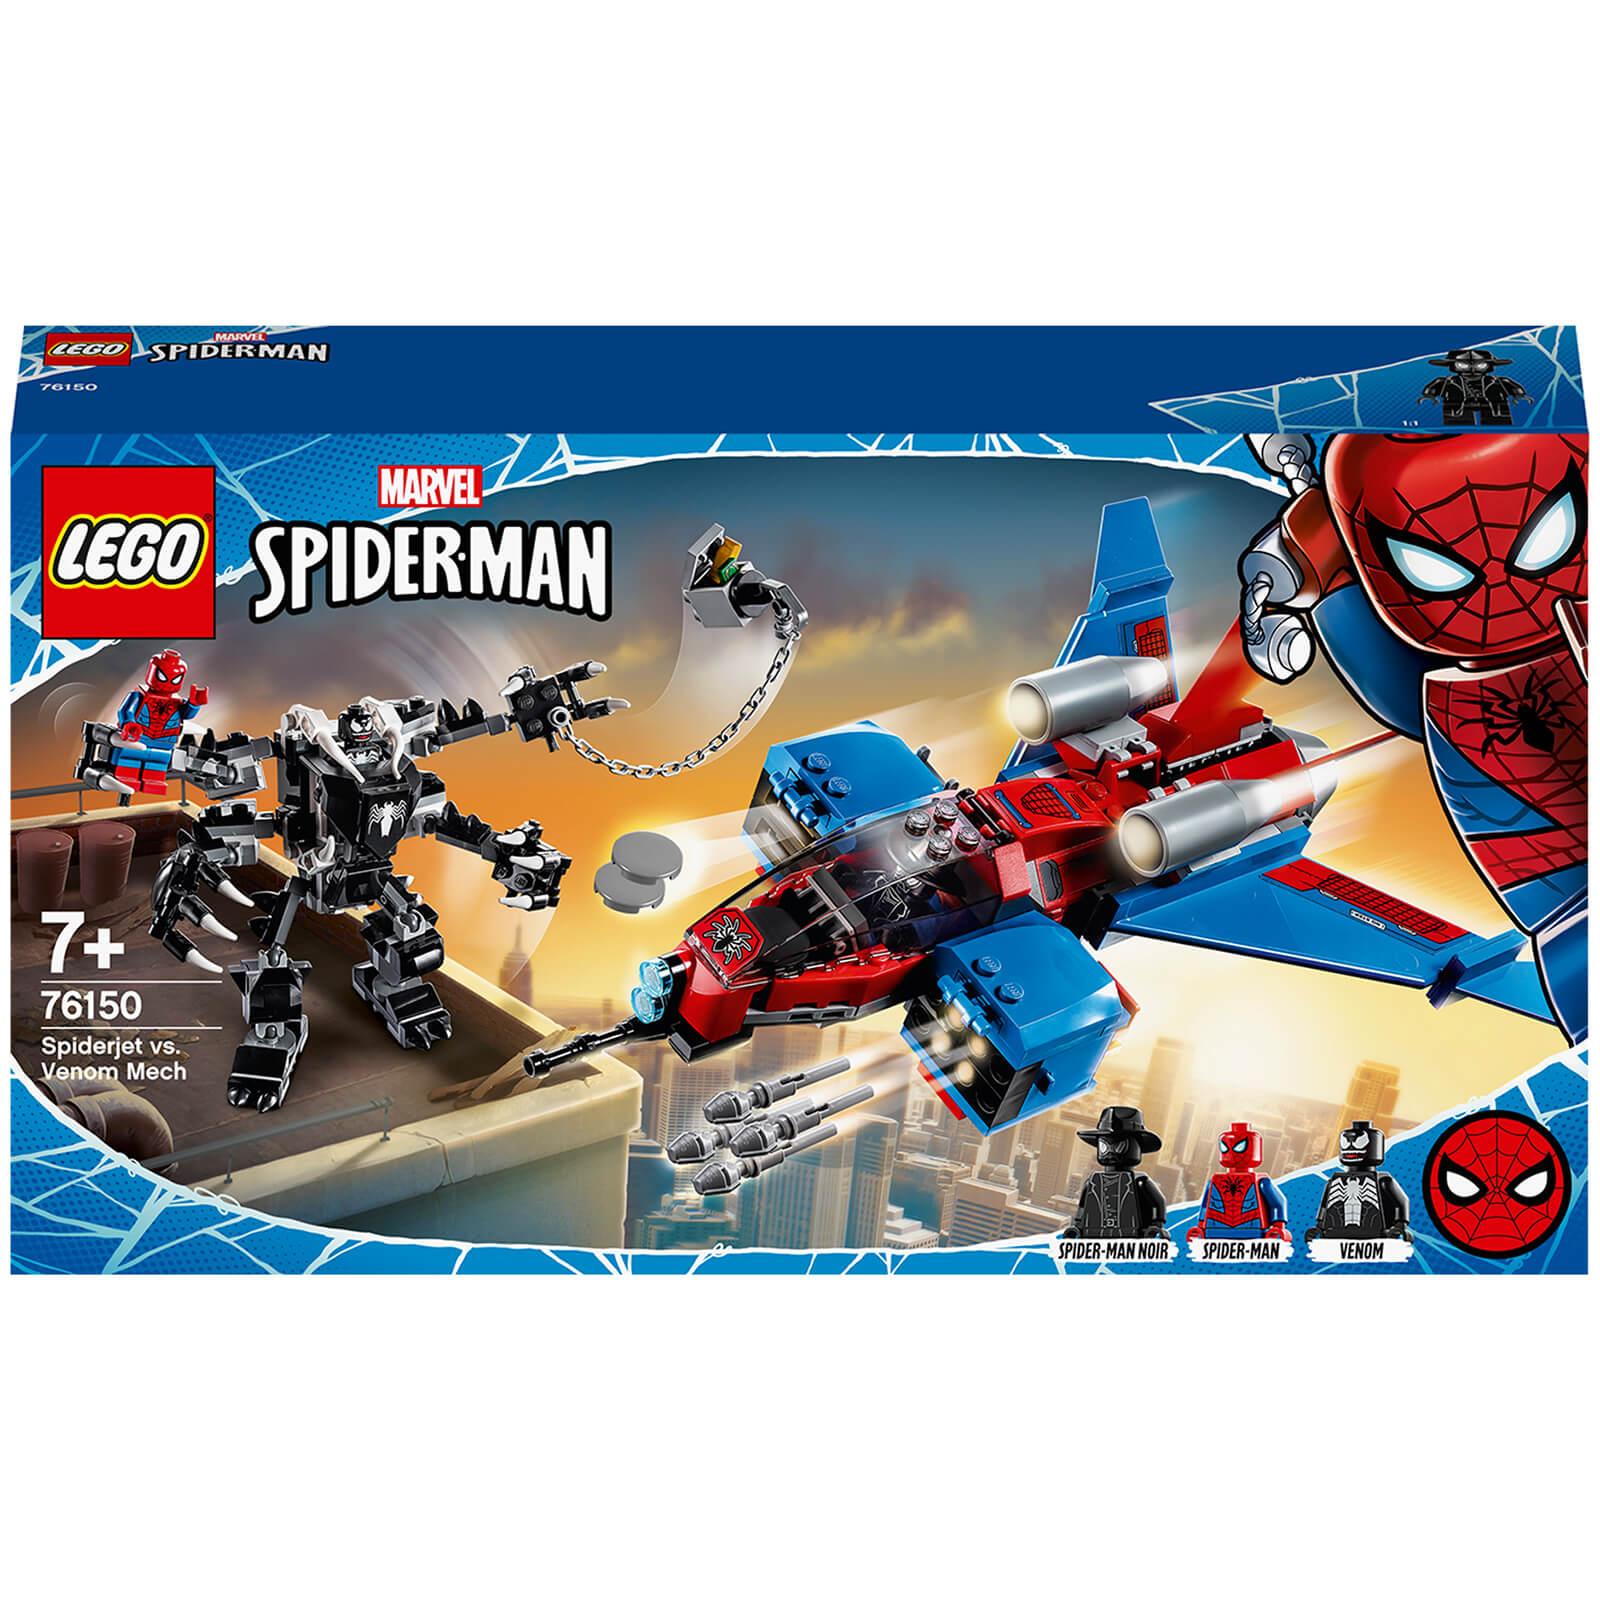 LEGO Marvel Spider-Man Jet vs 371pcs Venom Mech Playset 76150 Age 5